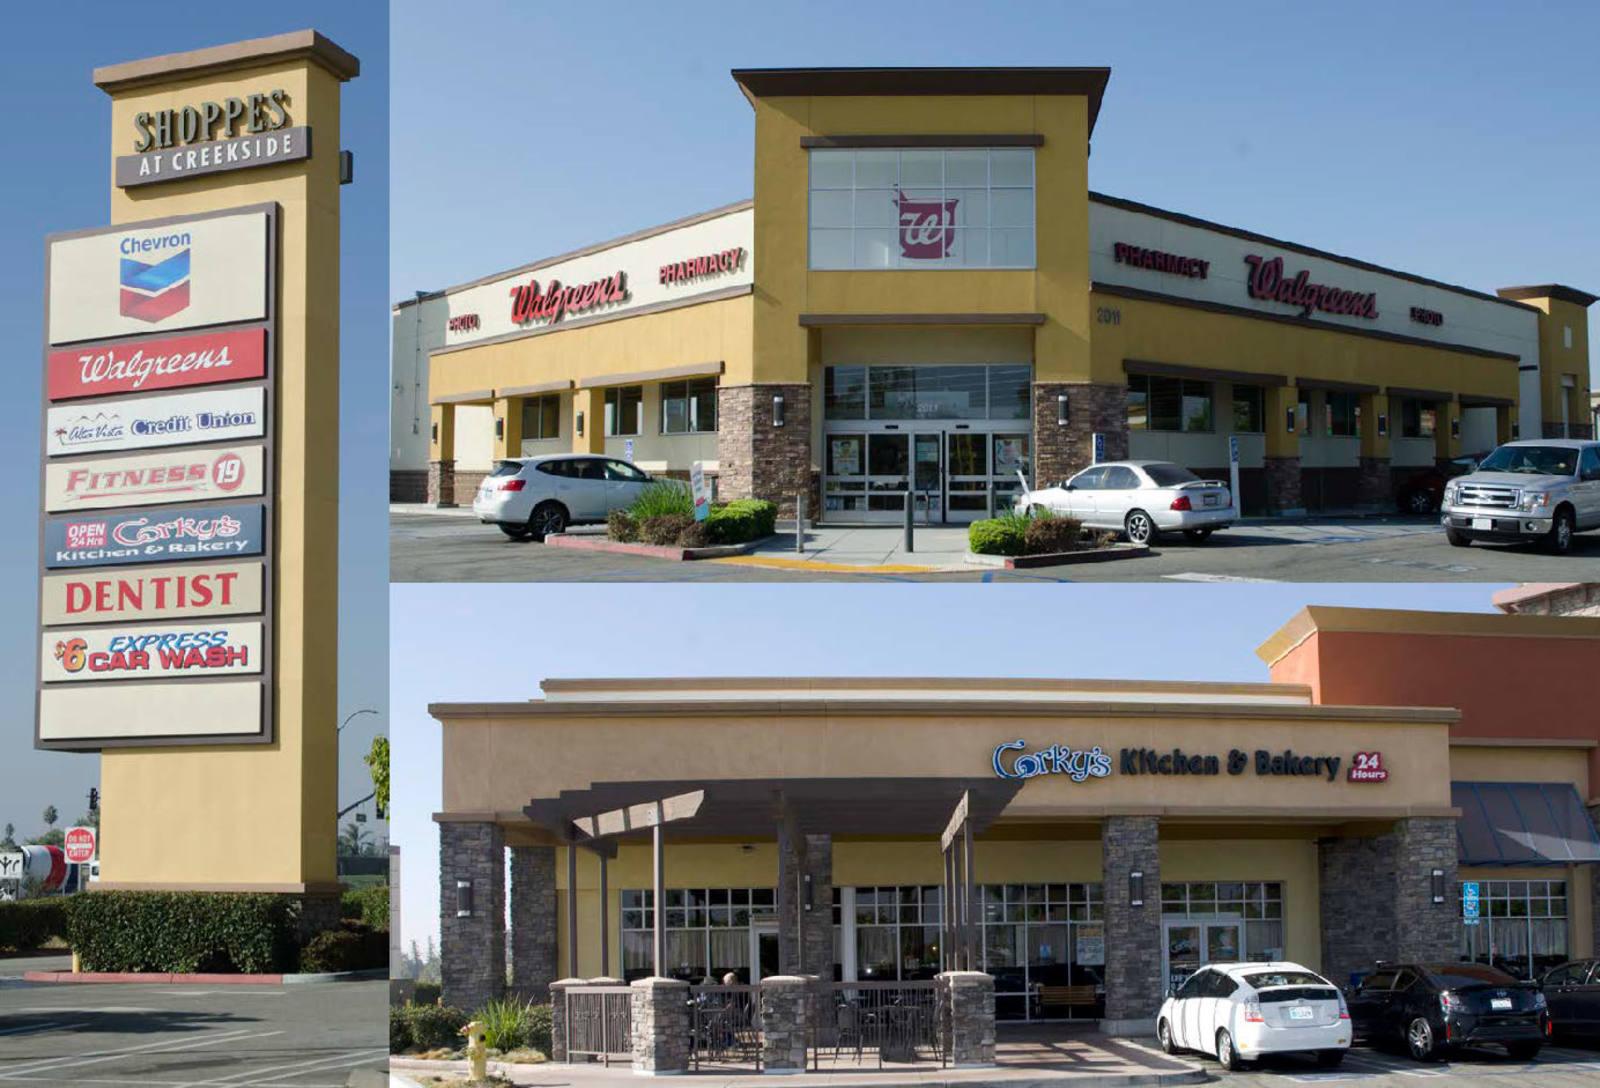 CBRE RetailShoppes At CreeksideNEC 210 Highway & Riverside Avenue  Photo